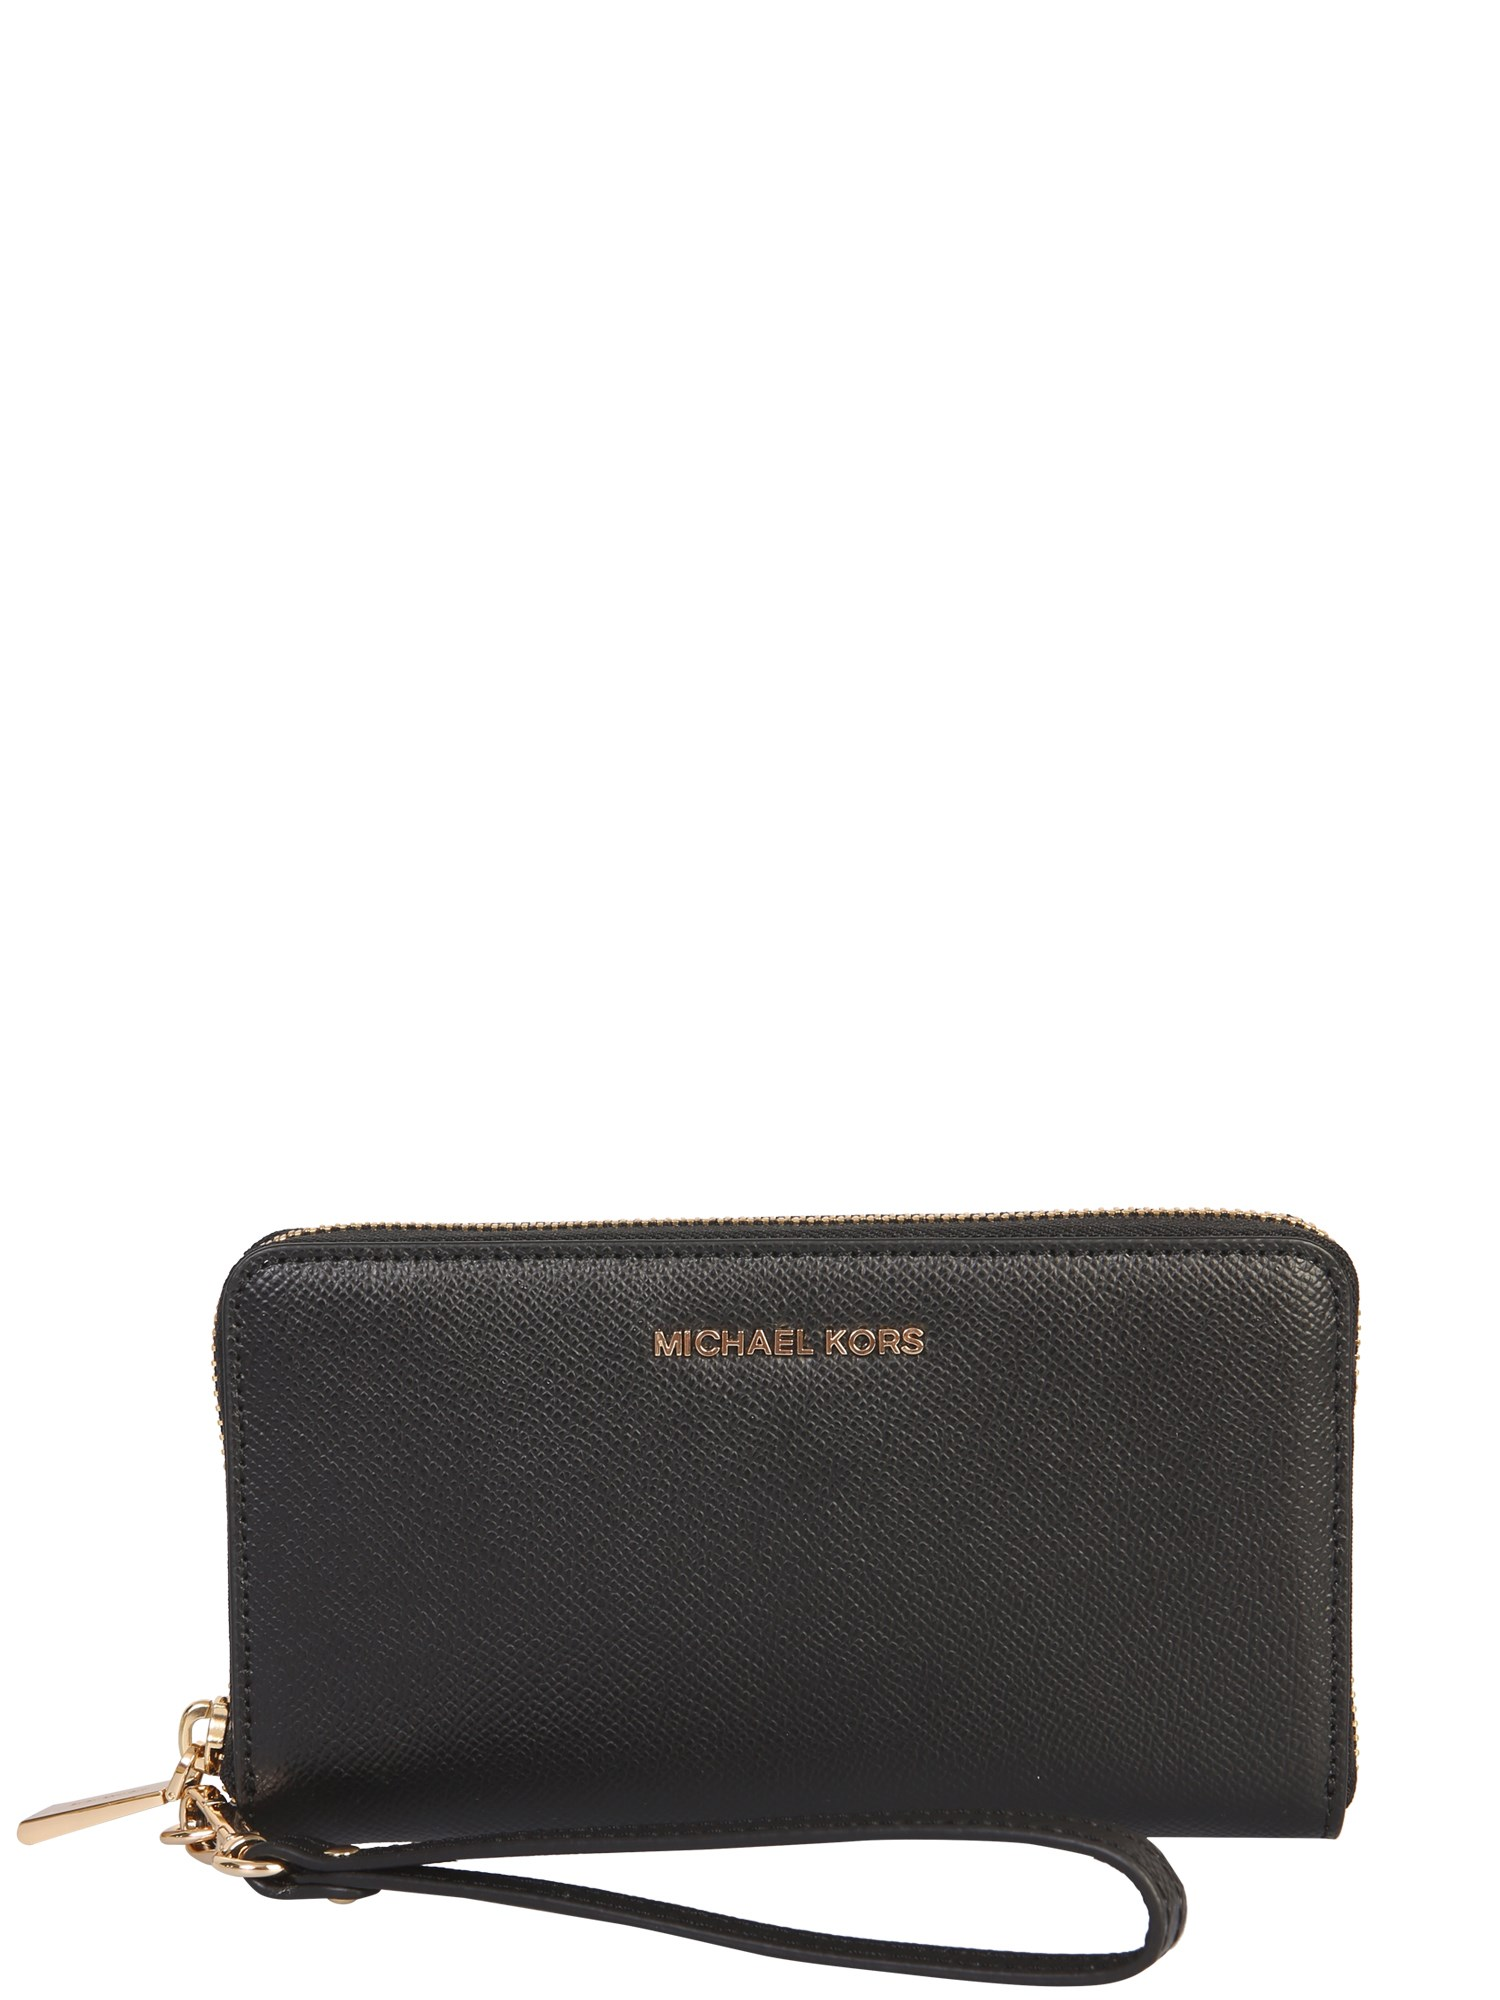 Michael Michael Kors Jet Set Wallet In Black